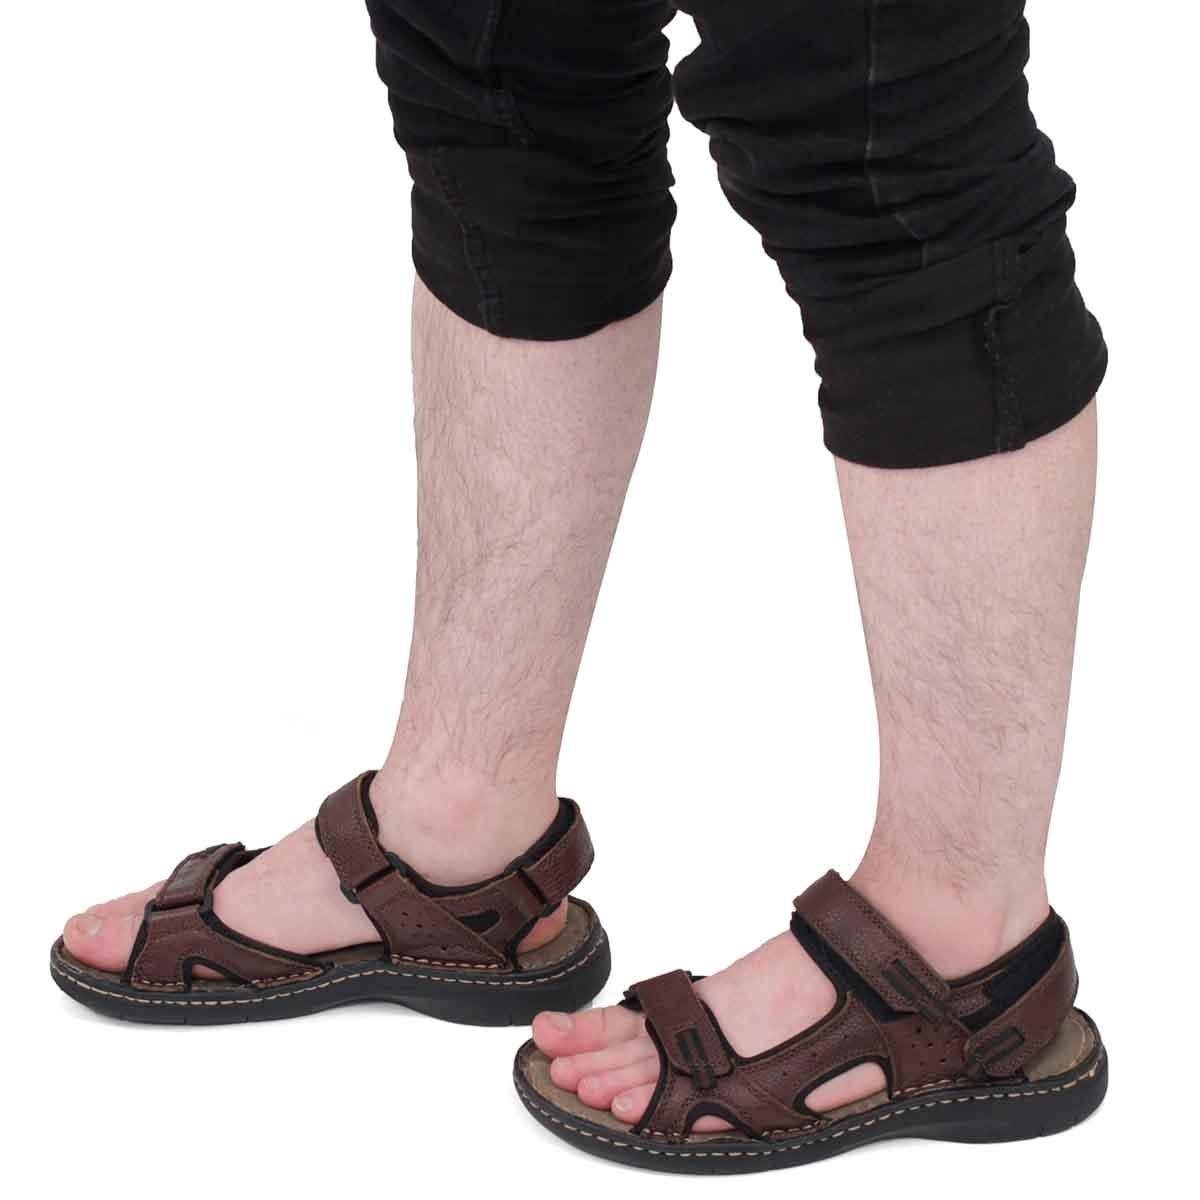 Mns Curtis 4 dk brn 3 strap sandal